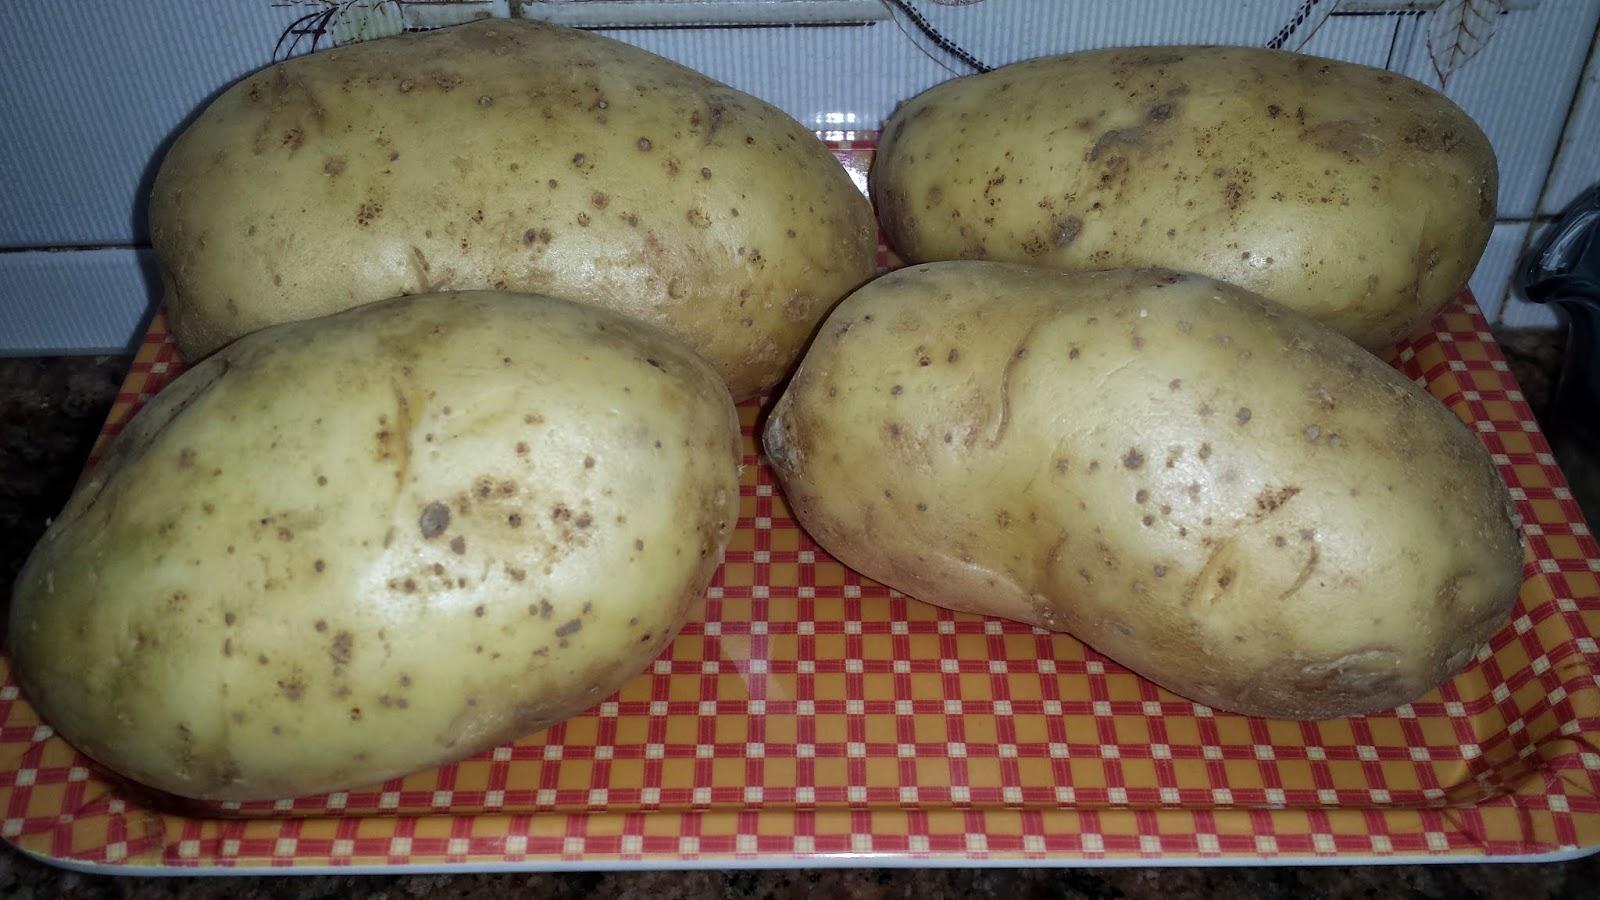 Pure de patata cremoso la cocina tradicional de cambalache3 - Pure de patatas cremoso ...